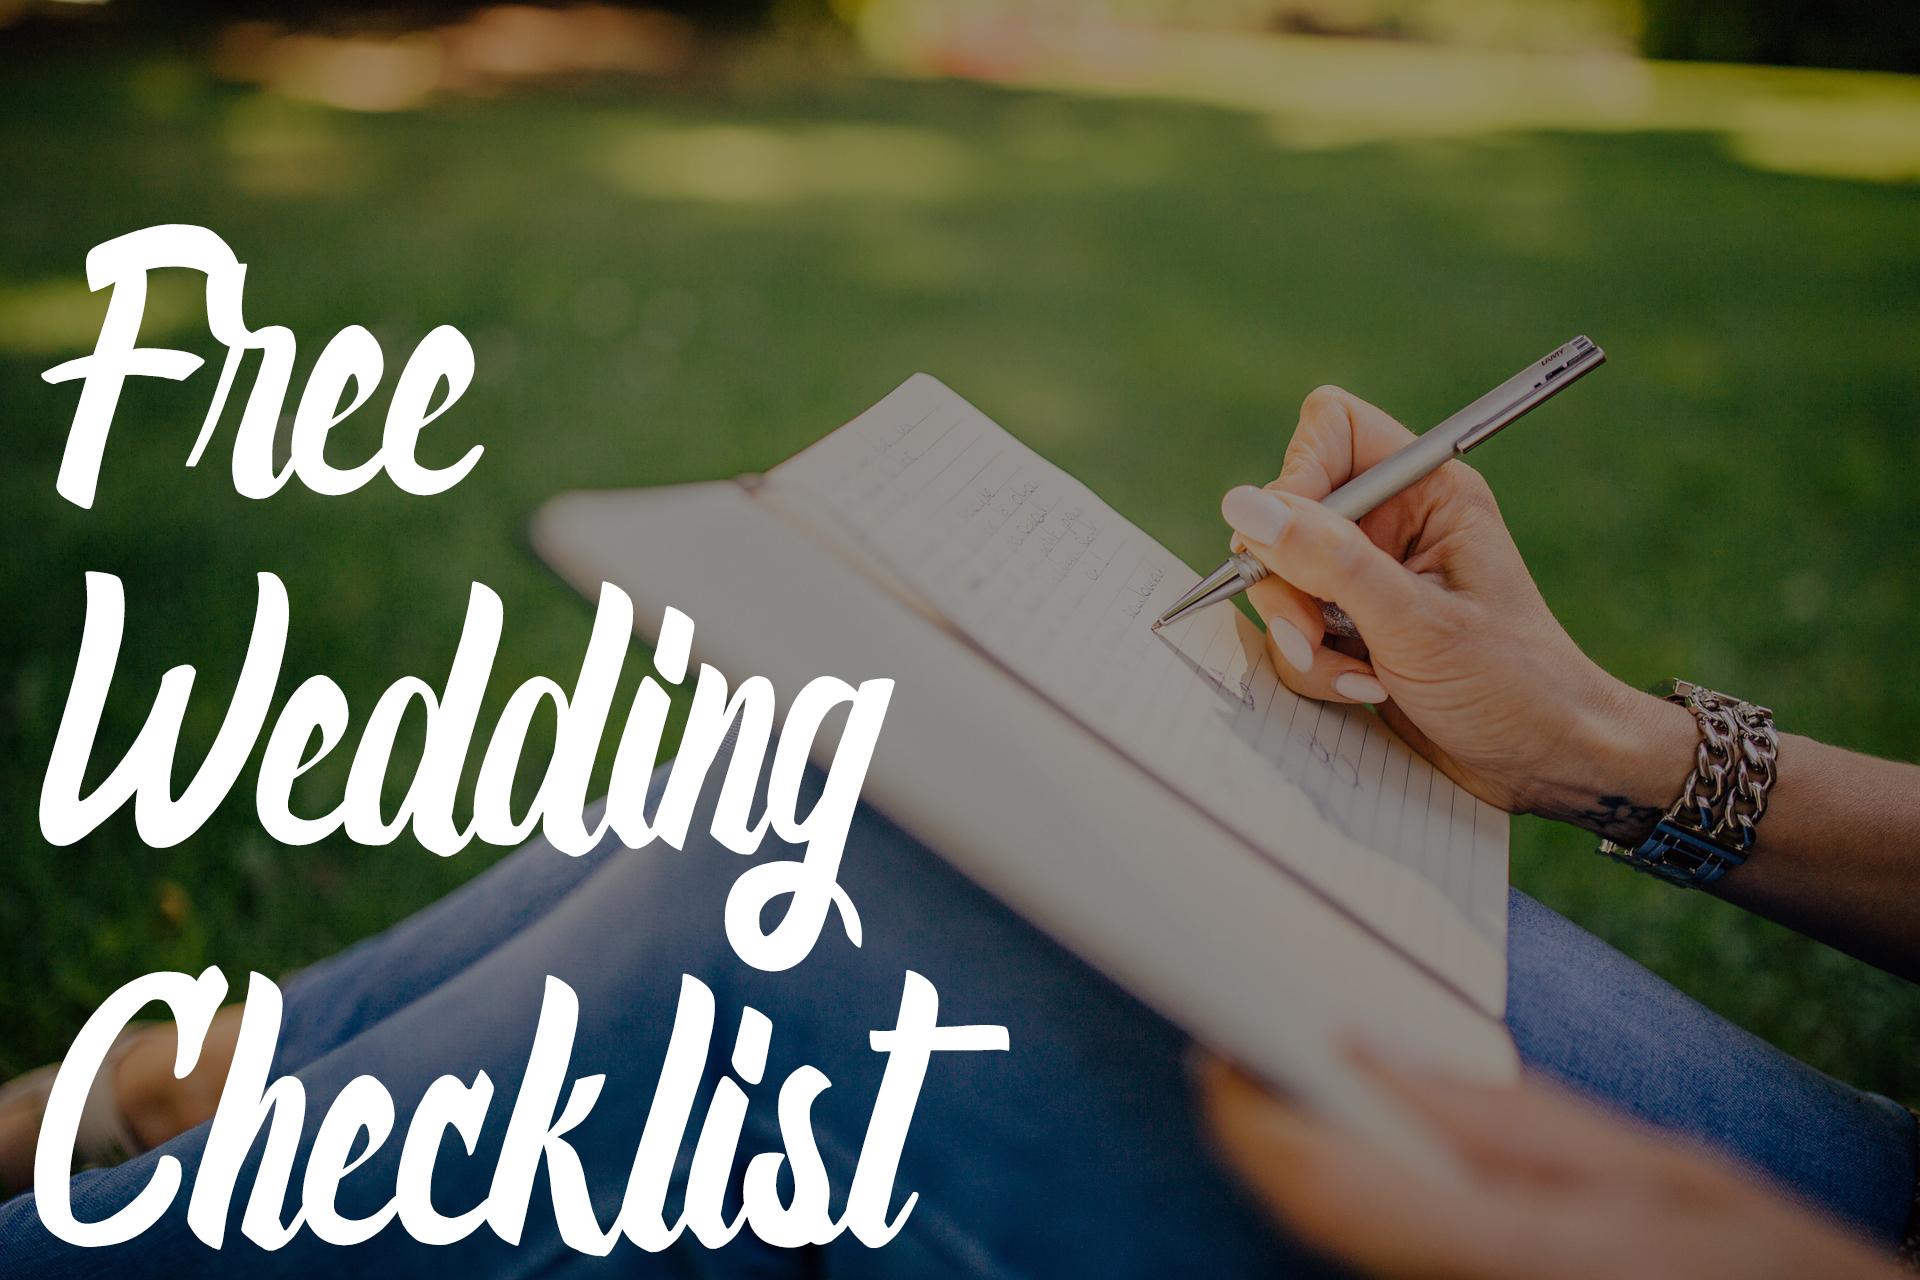 Free Checklist.jpg